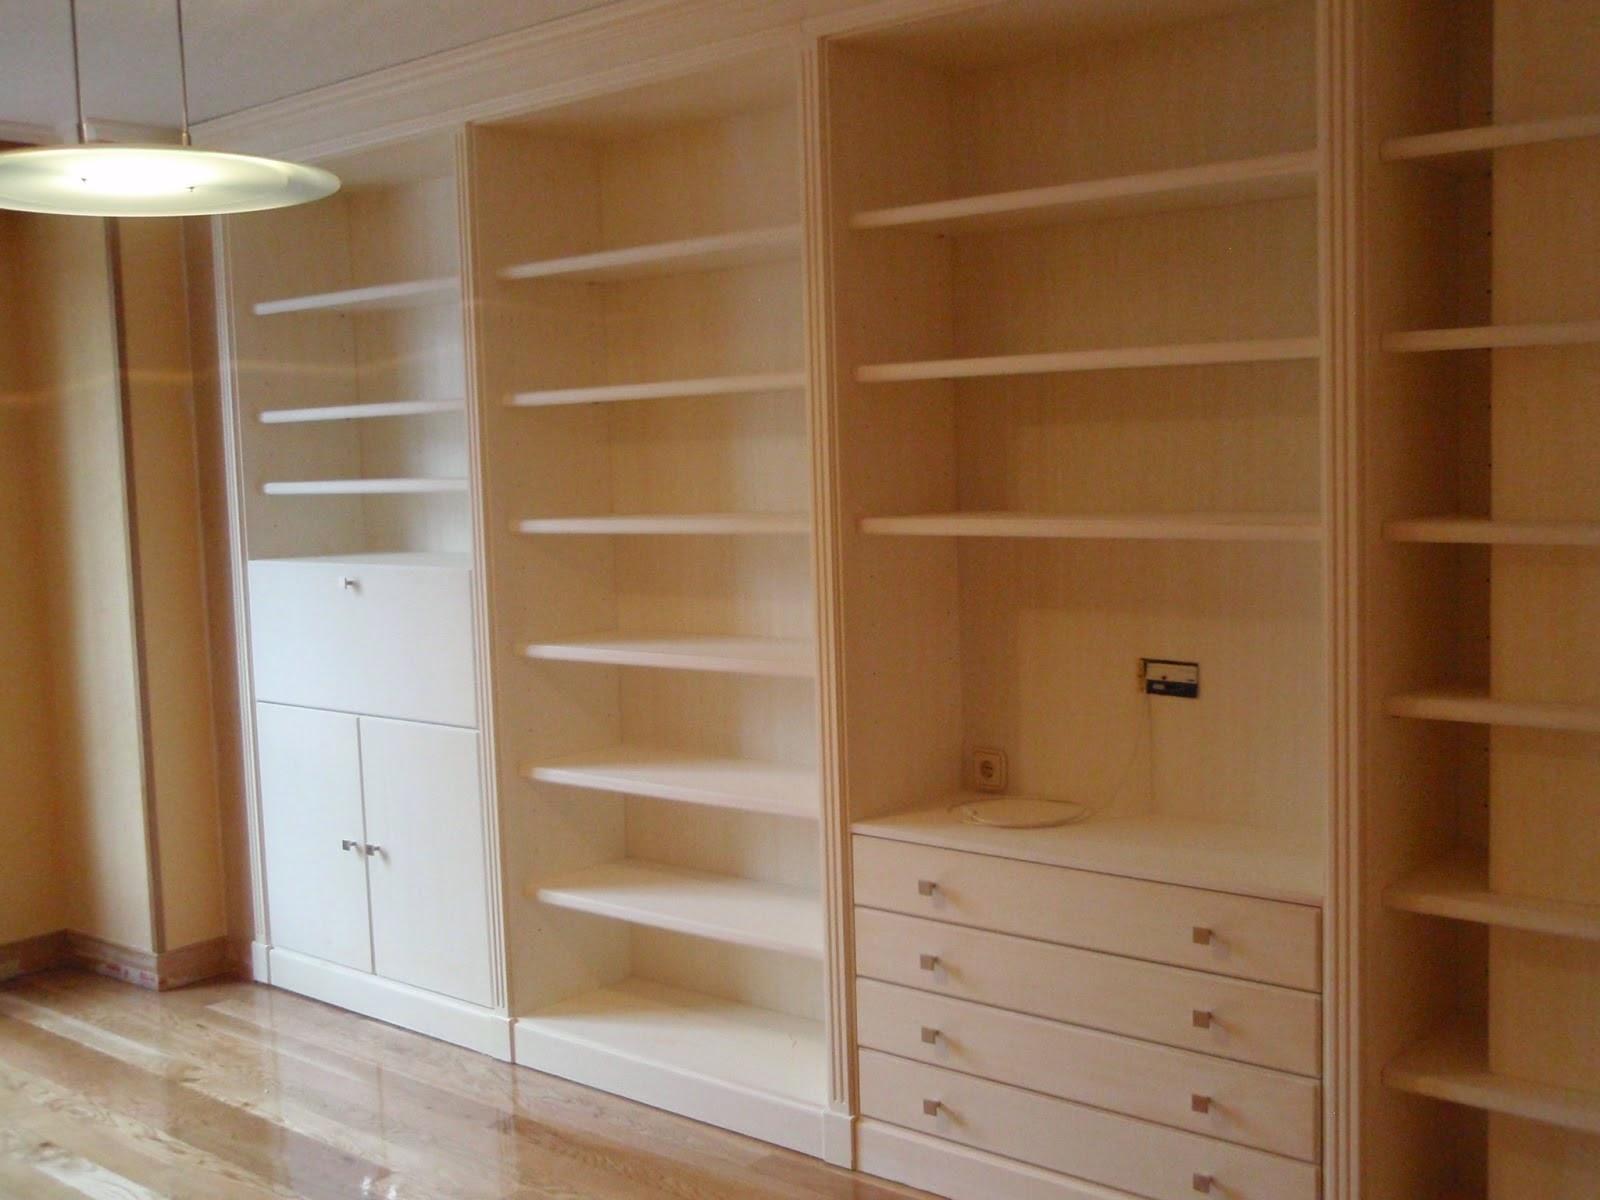 Soluciones de carpinter a a medida para su hogar - Muebles a medida sevilla ...